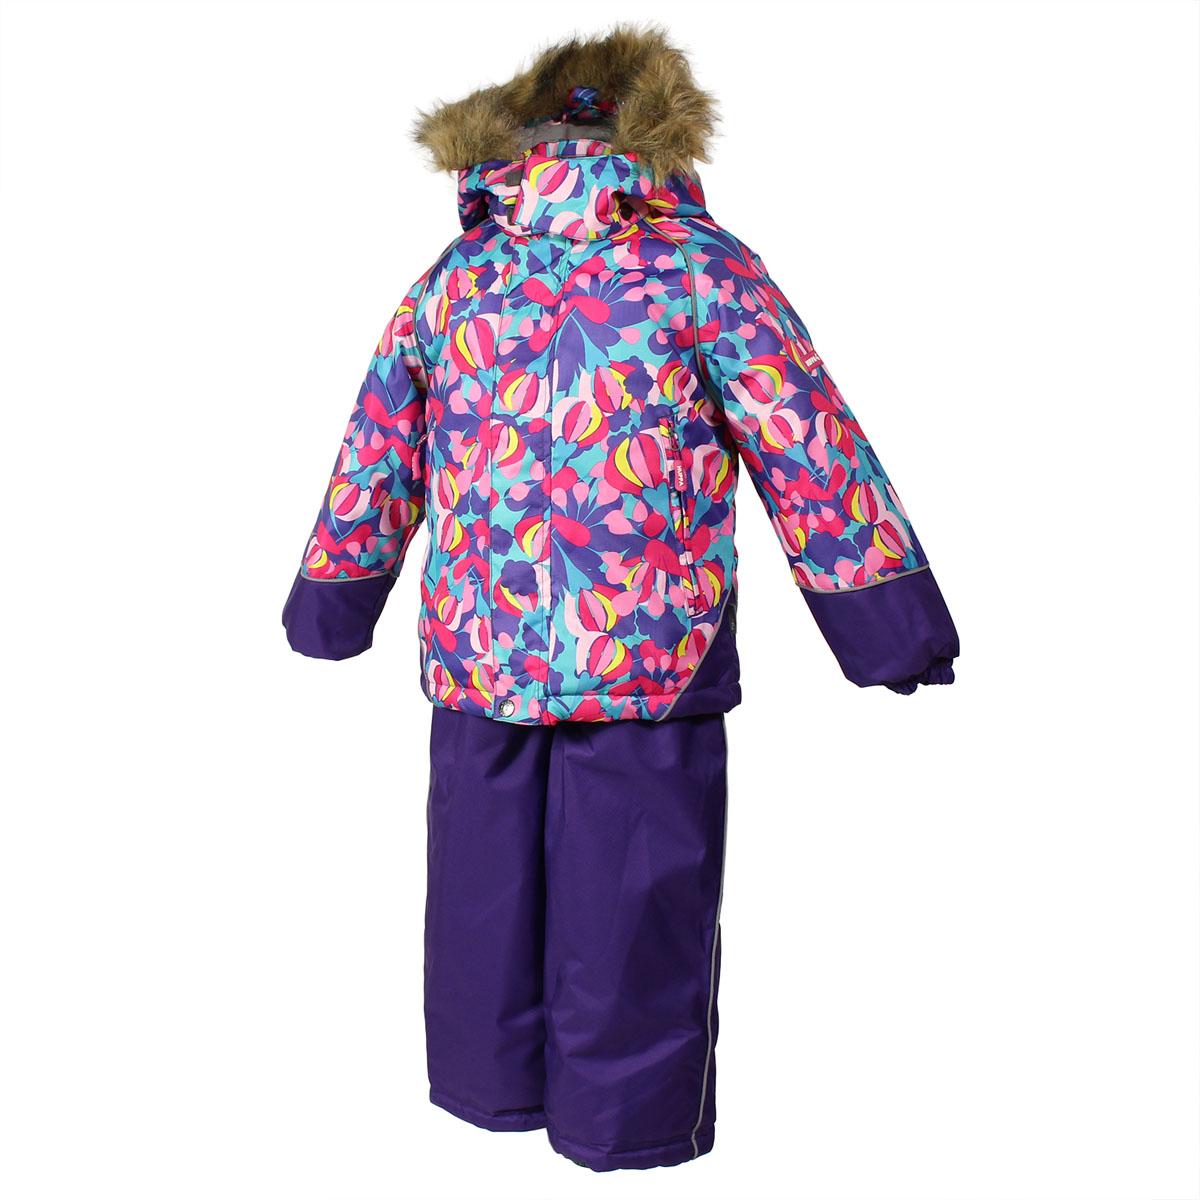 Huppa Комплект для девочки Enzy: куртка, полукомбинезон. 4131CW15_J